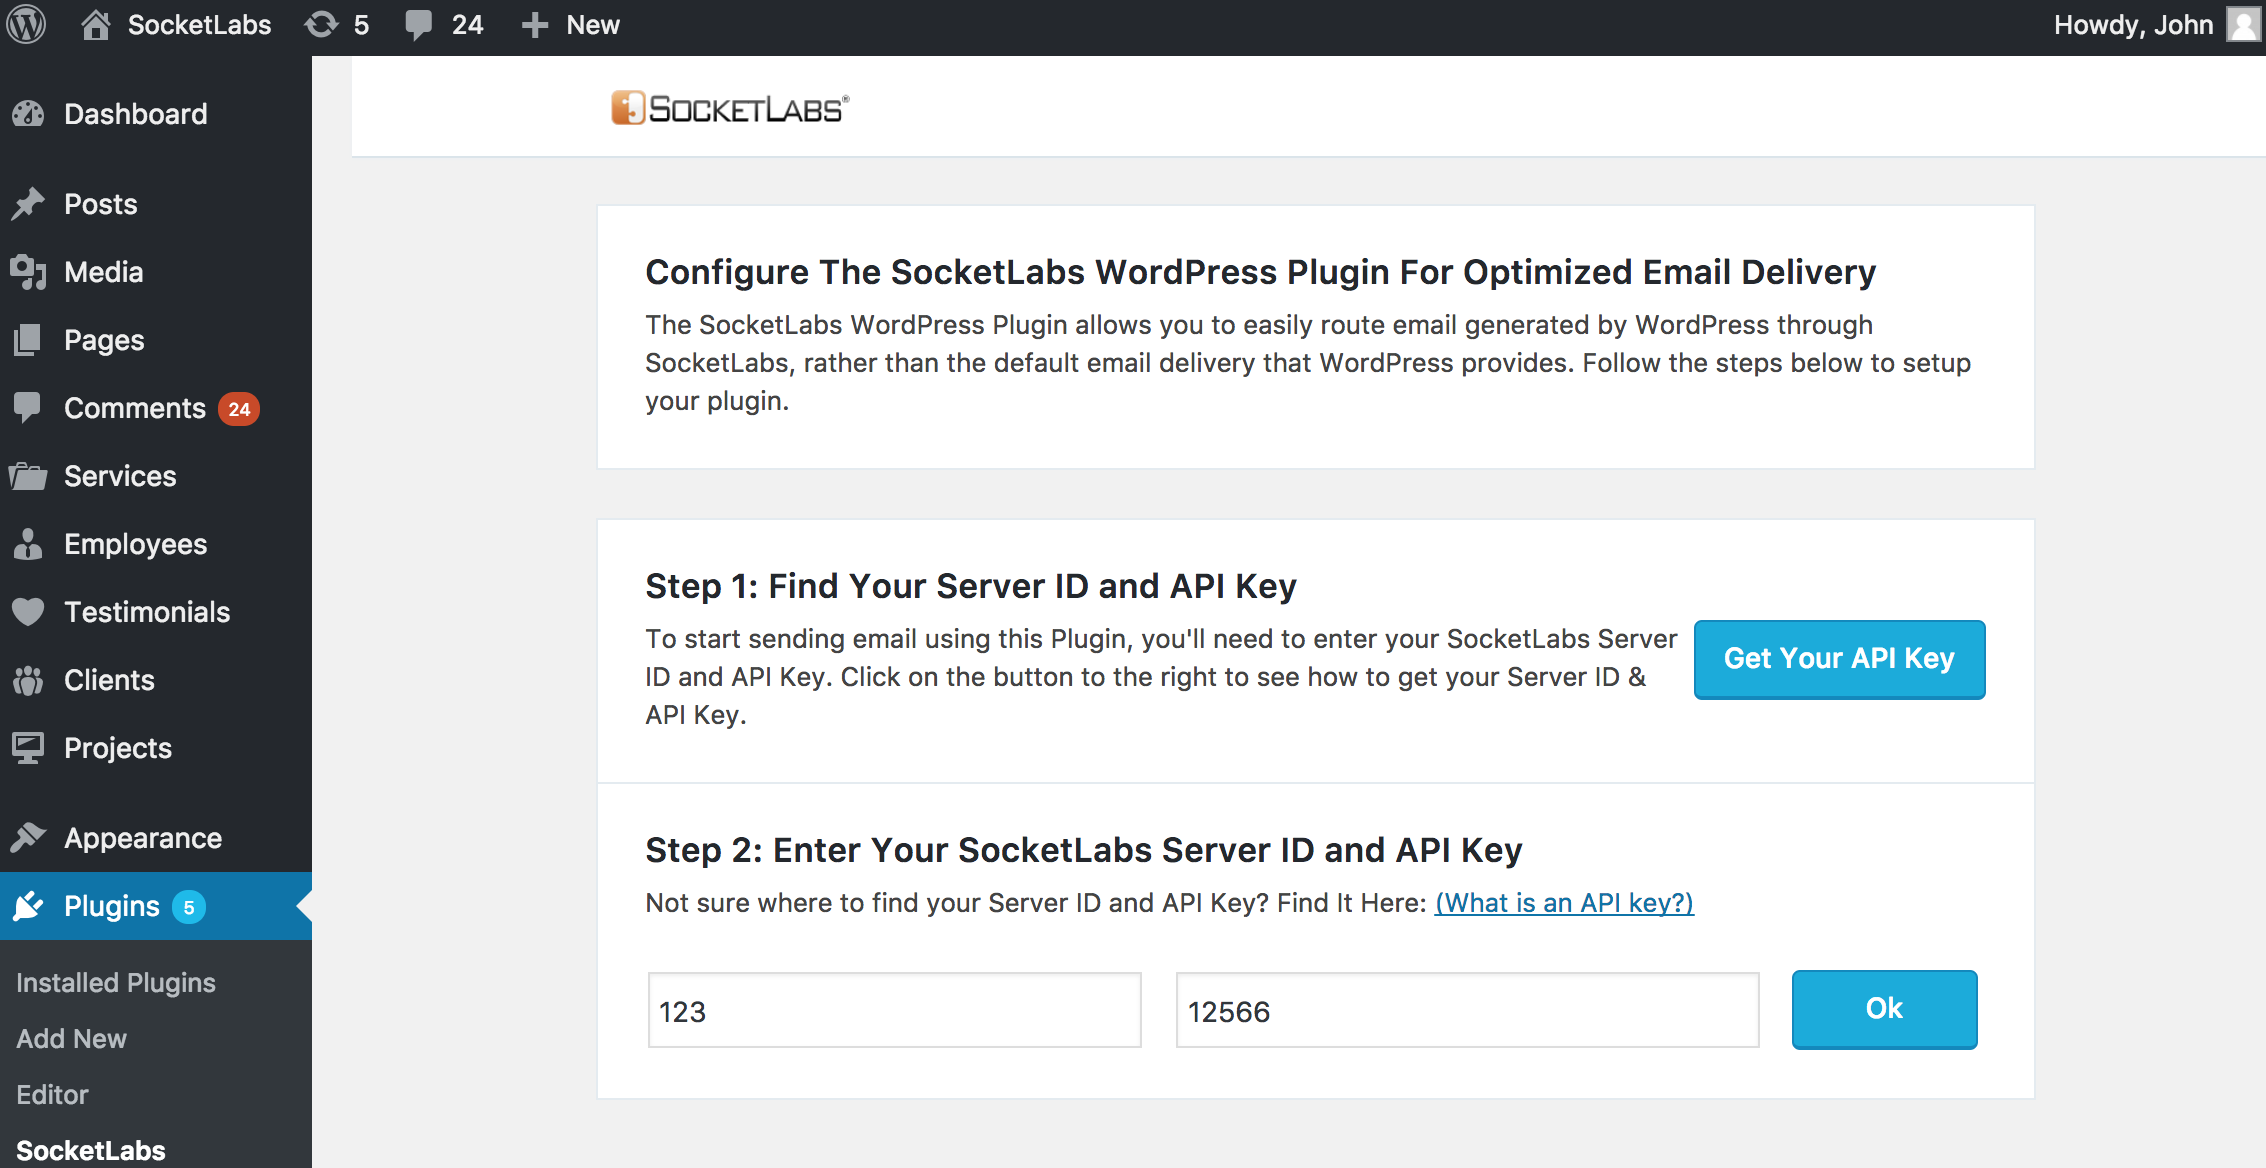 SocketLabs WordPress Plugin